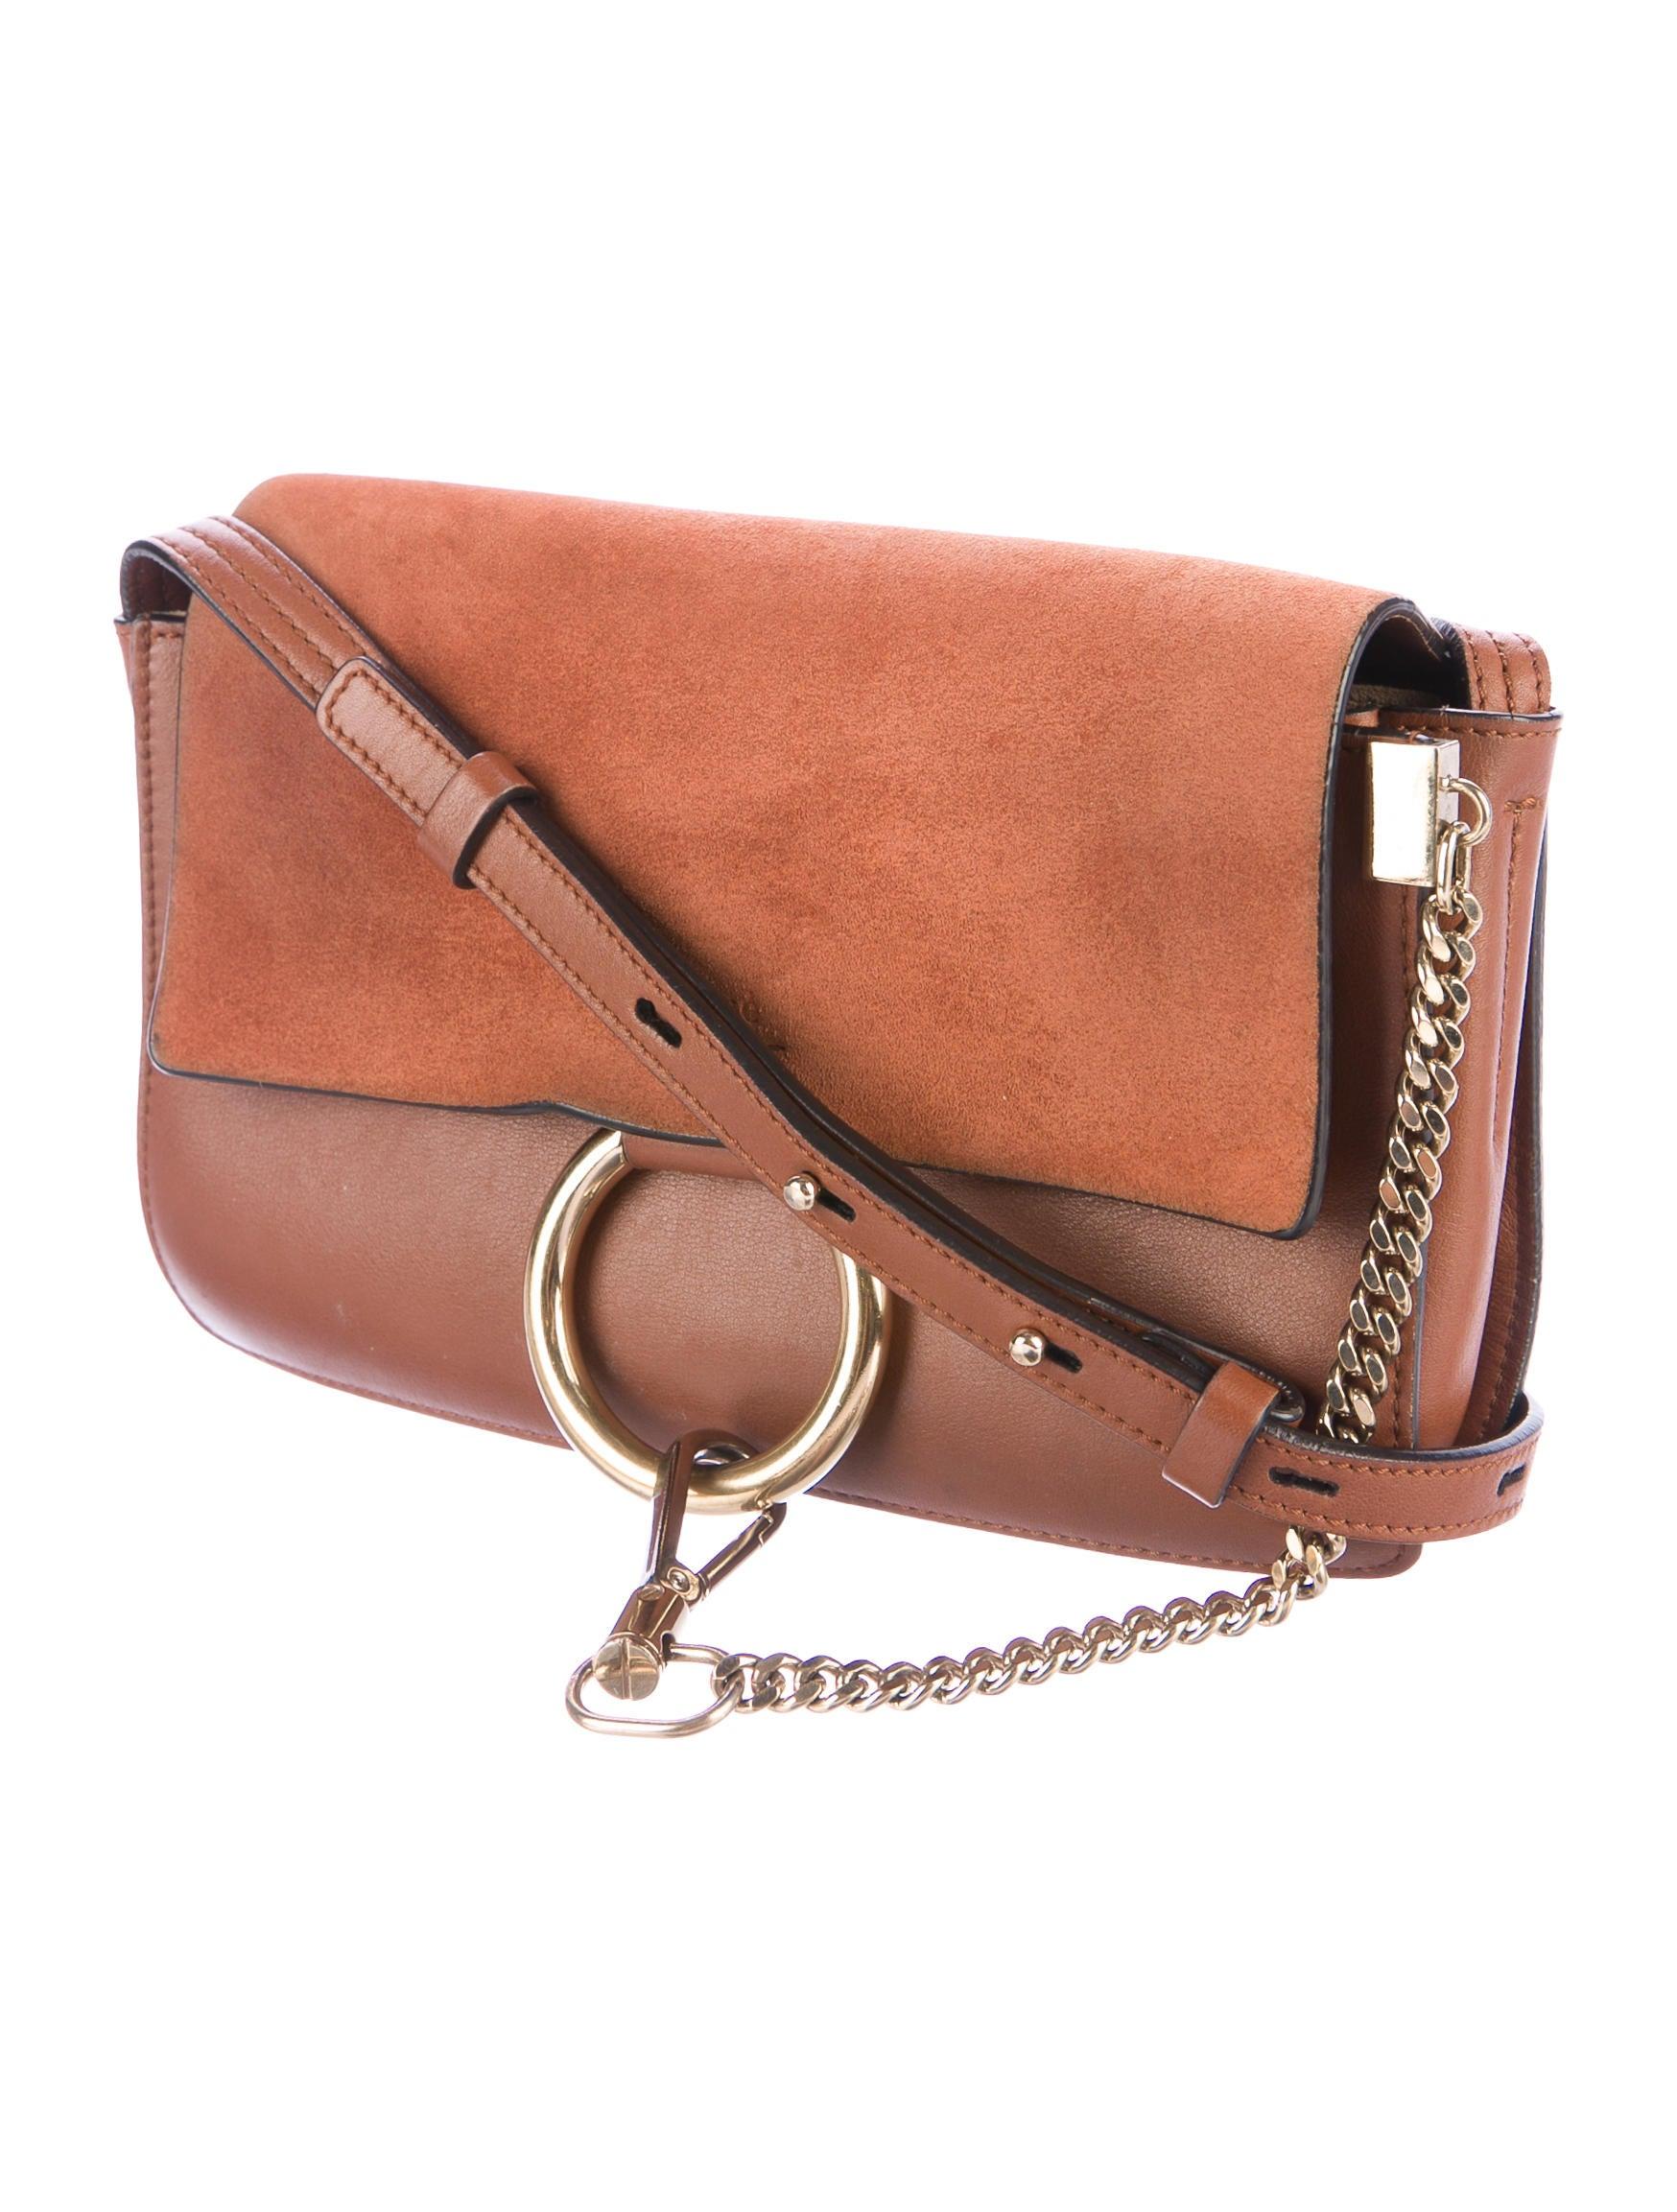 chlo faye small shoulder bag handbags chl61610 the realreal. Black Bedroom Furniture Sets. Home Design Ideas